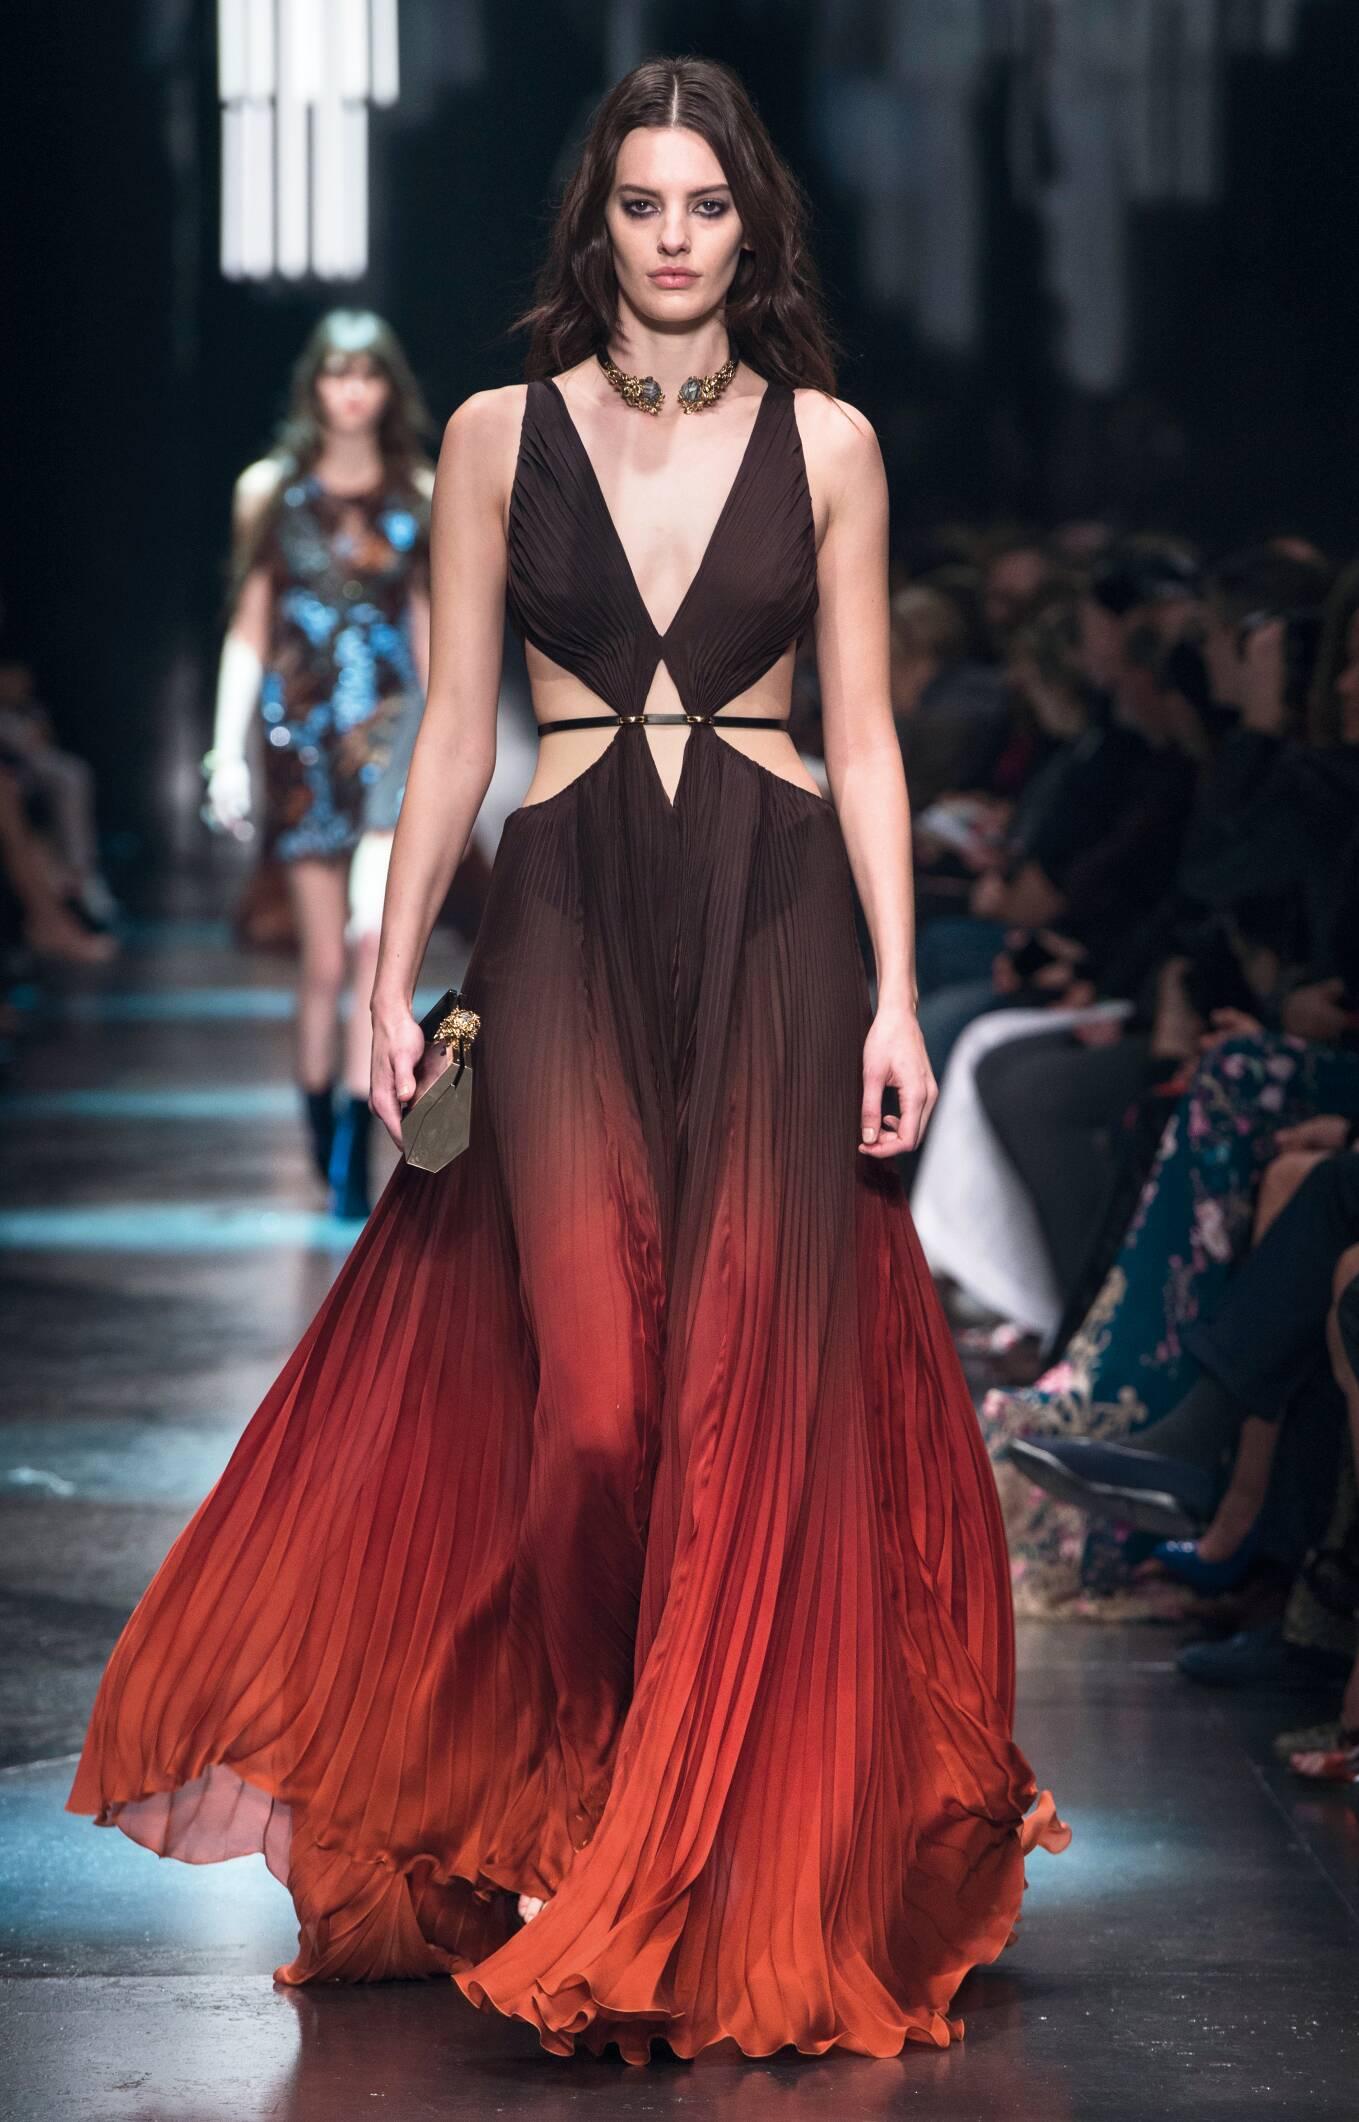 Ffa official dresses description for fashion shows